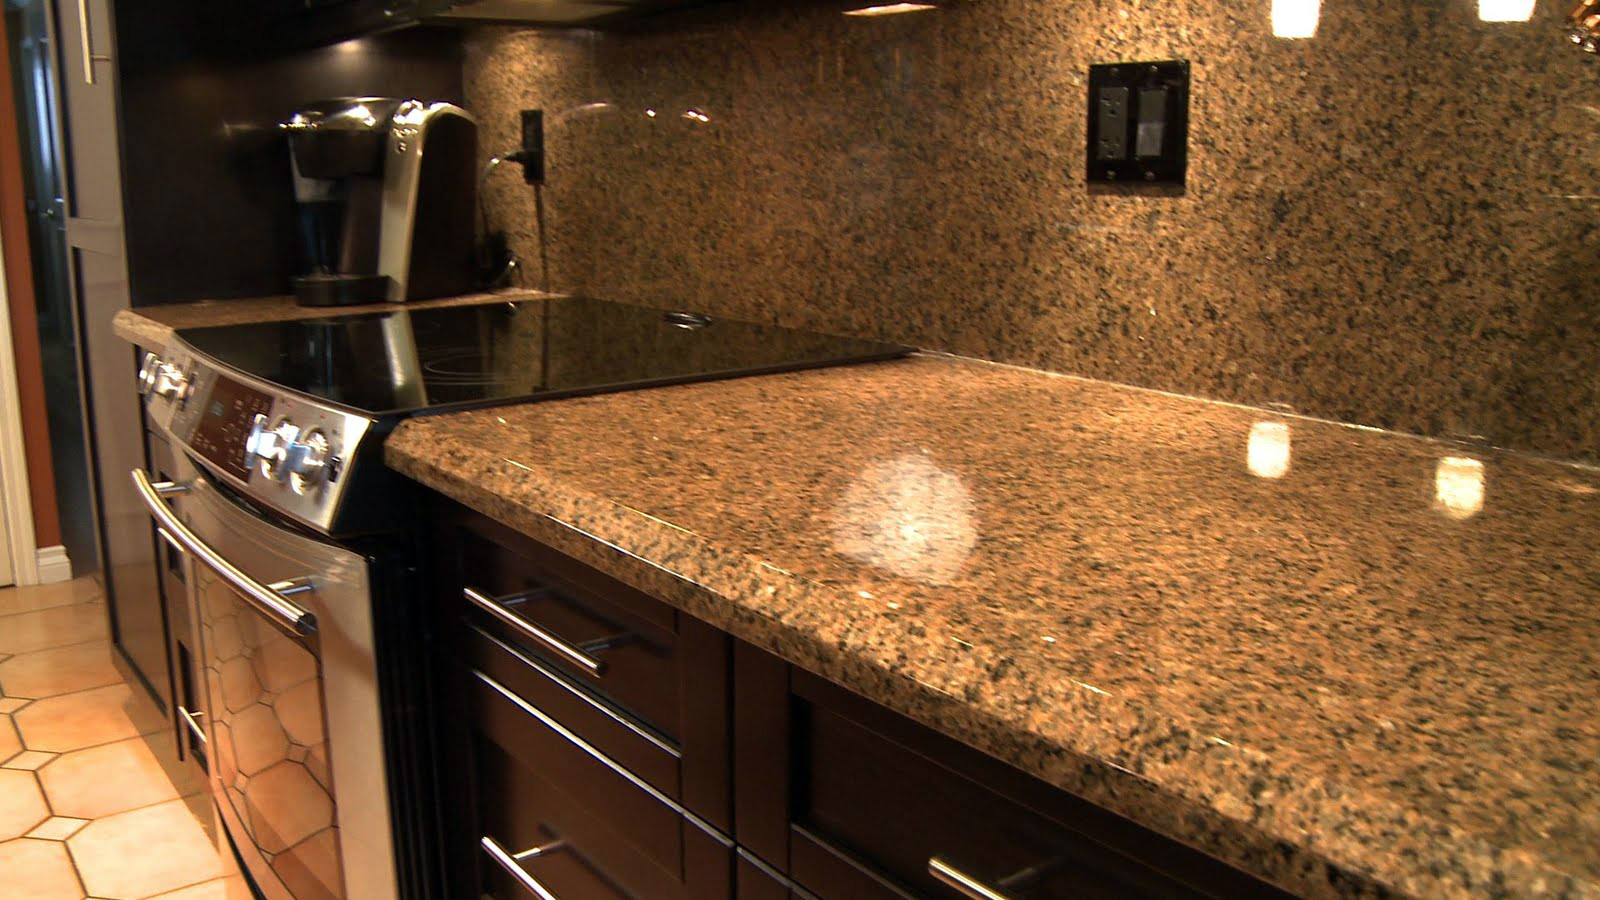 Golden-Leaf-Granite-Kitchen-Countertop-Island-Granix-5